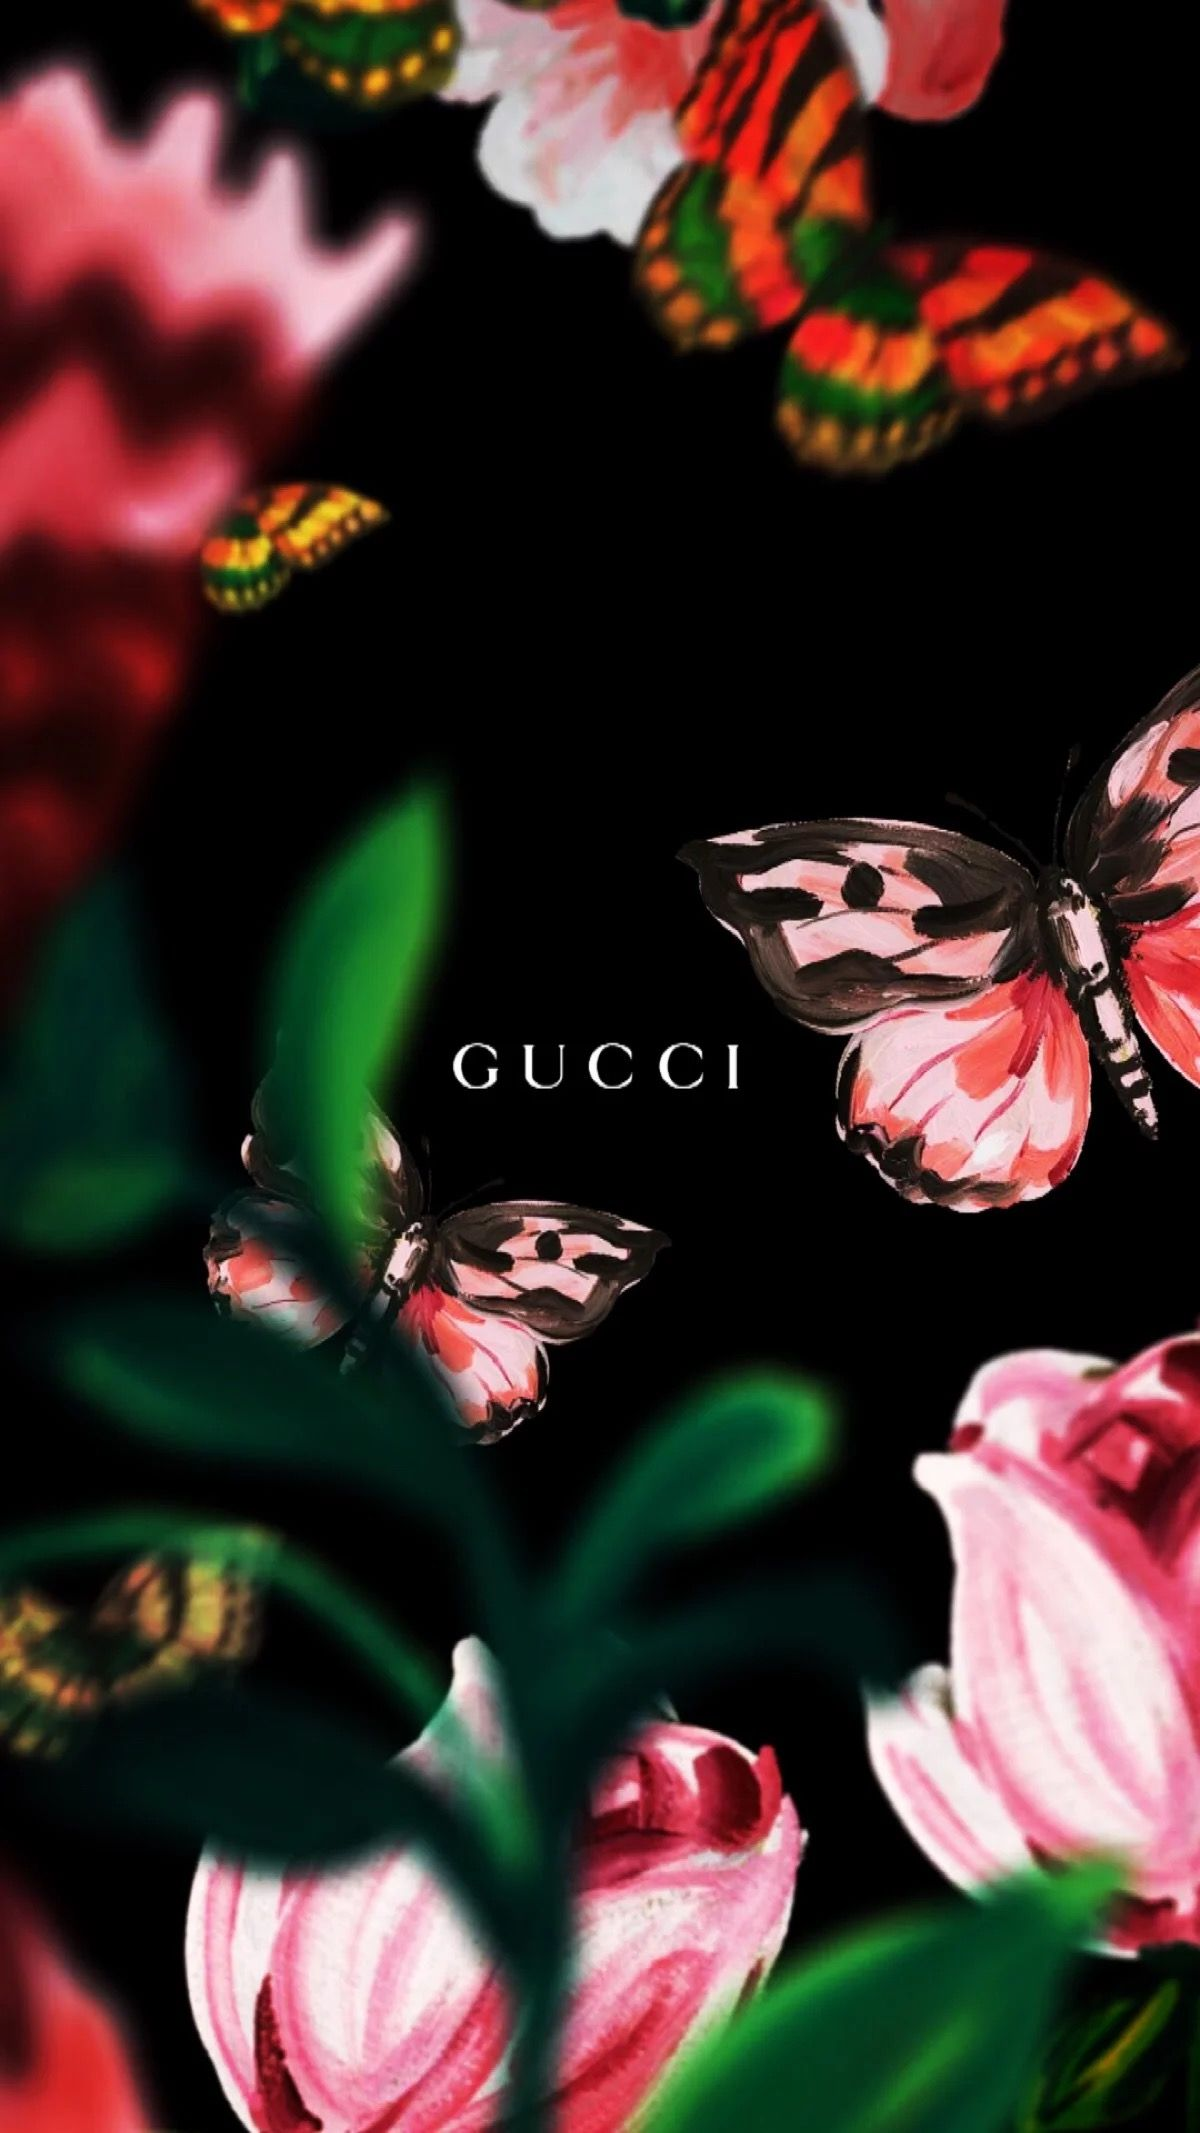 Gucci Snake Wallpaper Iphone X Pin De Pankeawป่านแก้ว En Wallpaper Fondo De Pantalla